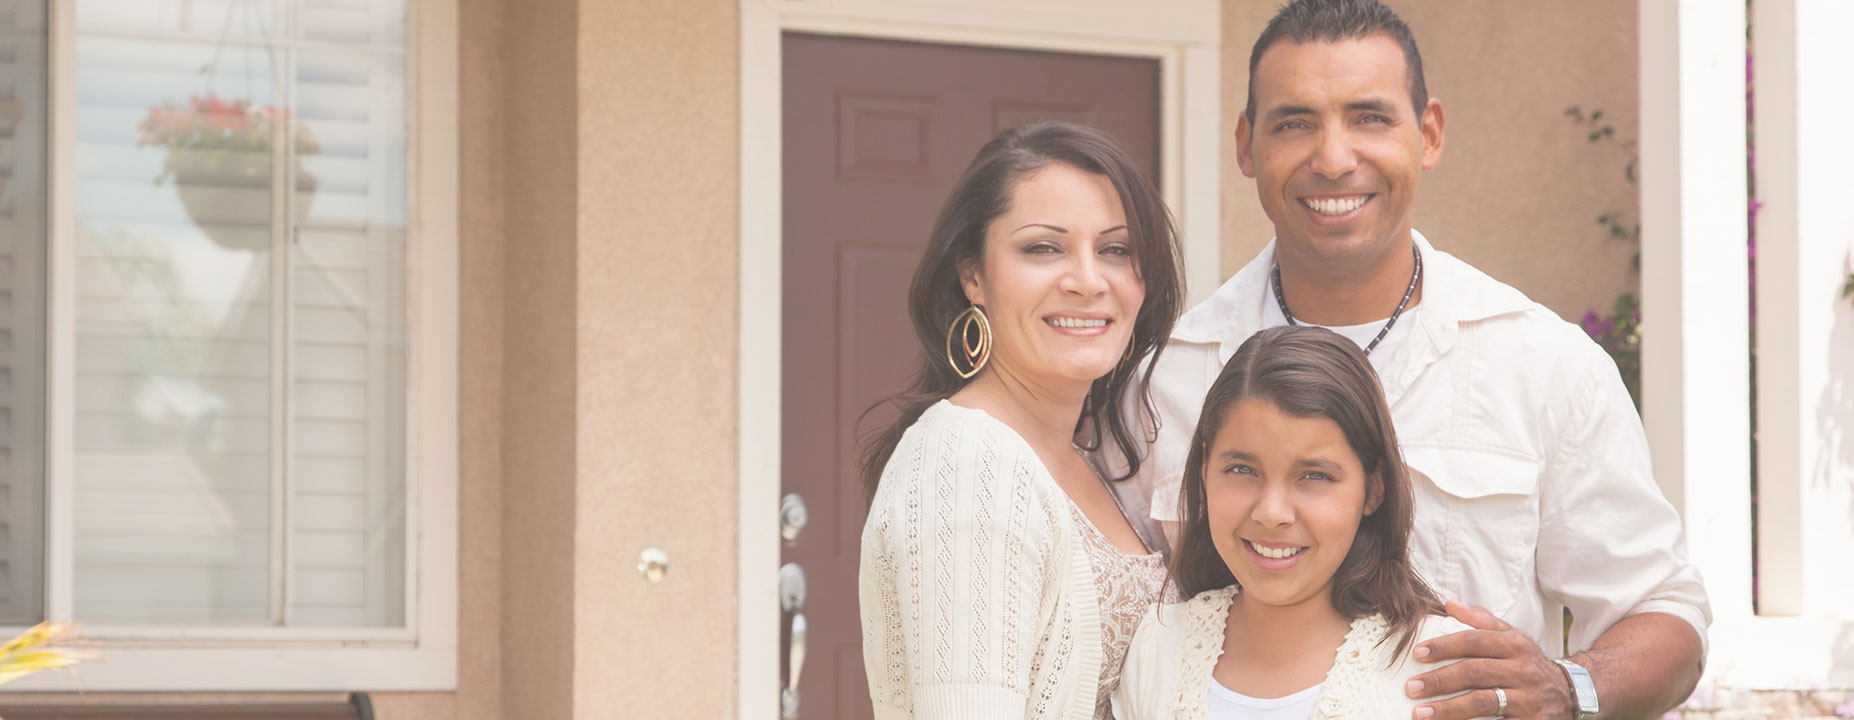 El Paso Modern Dentistry - Blog